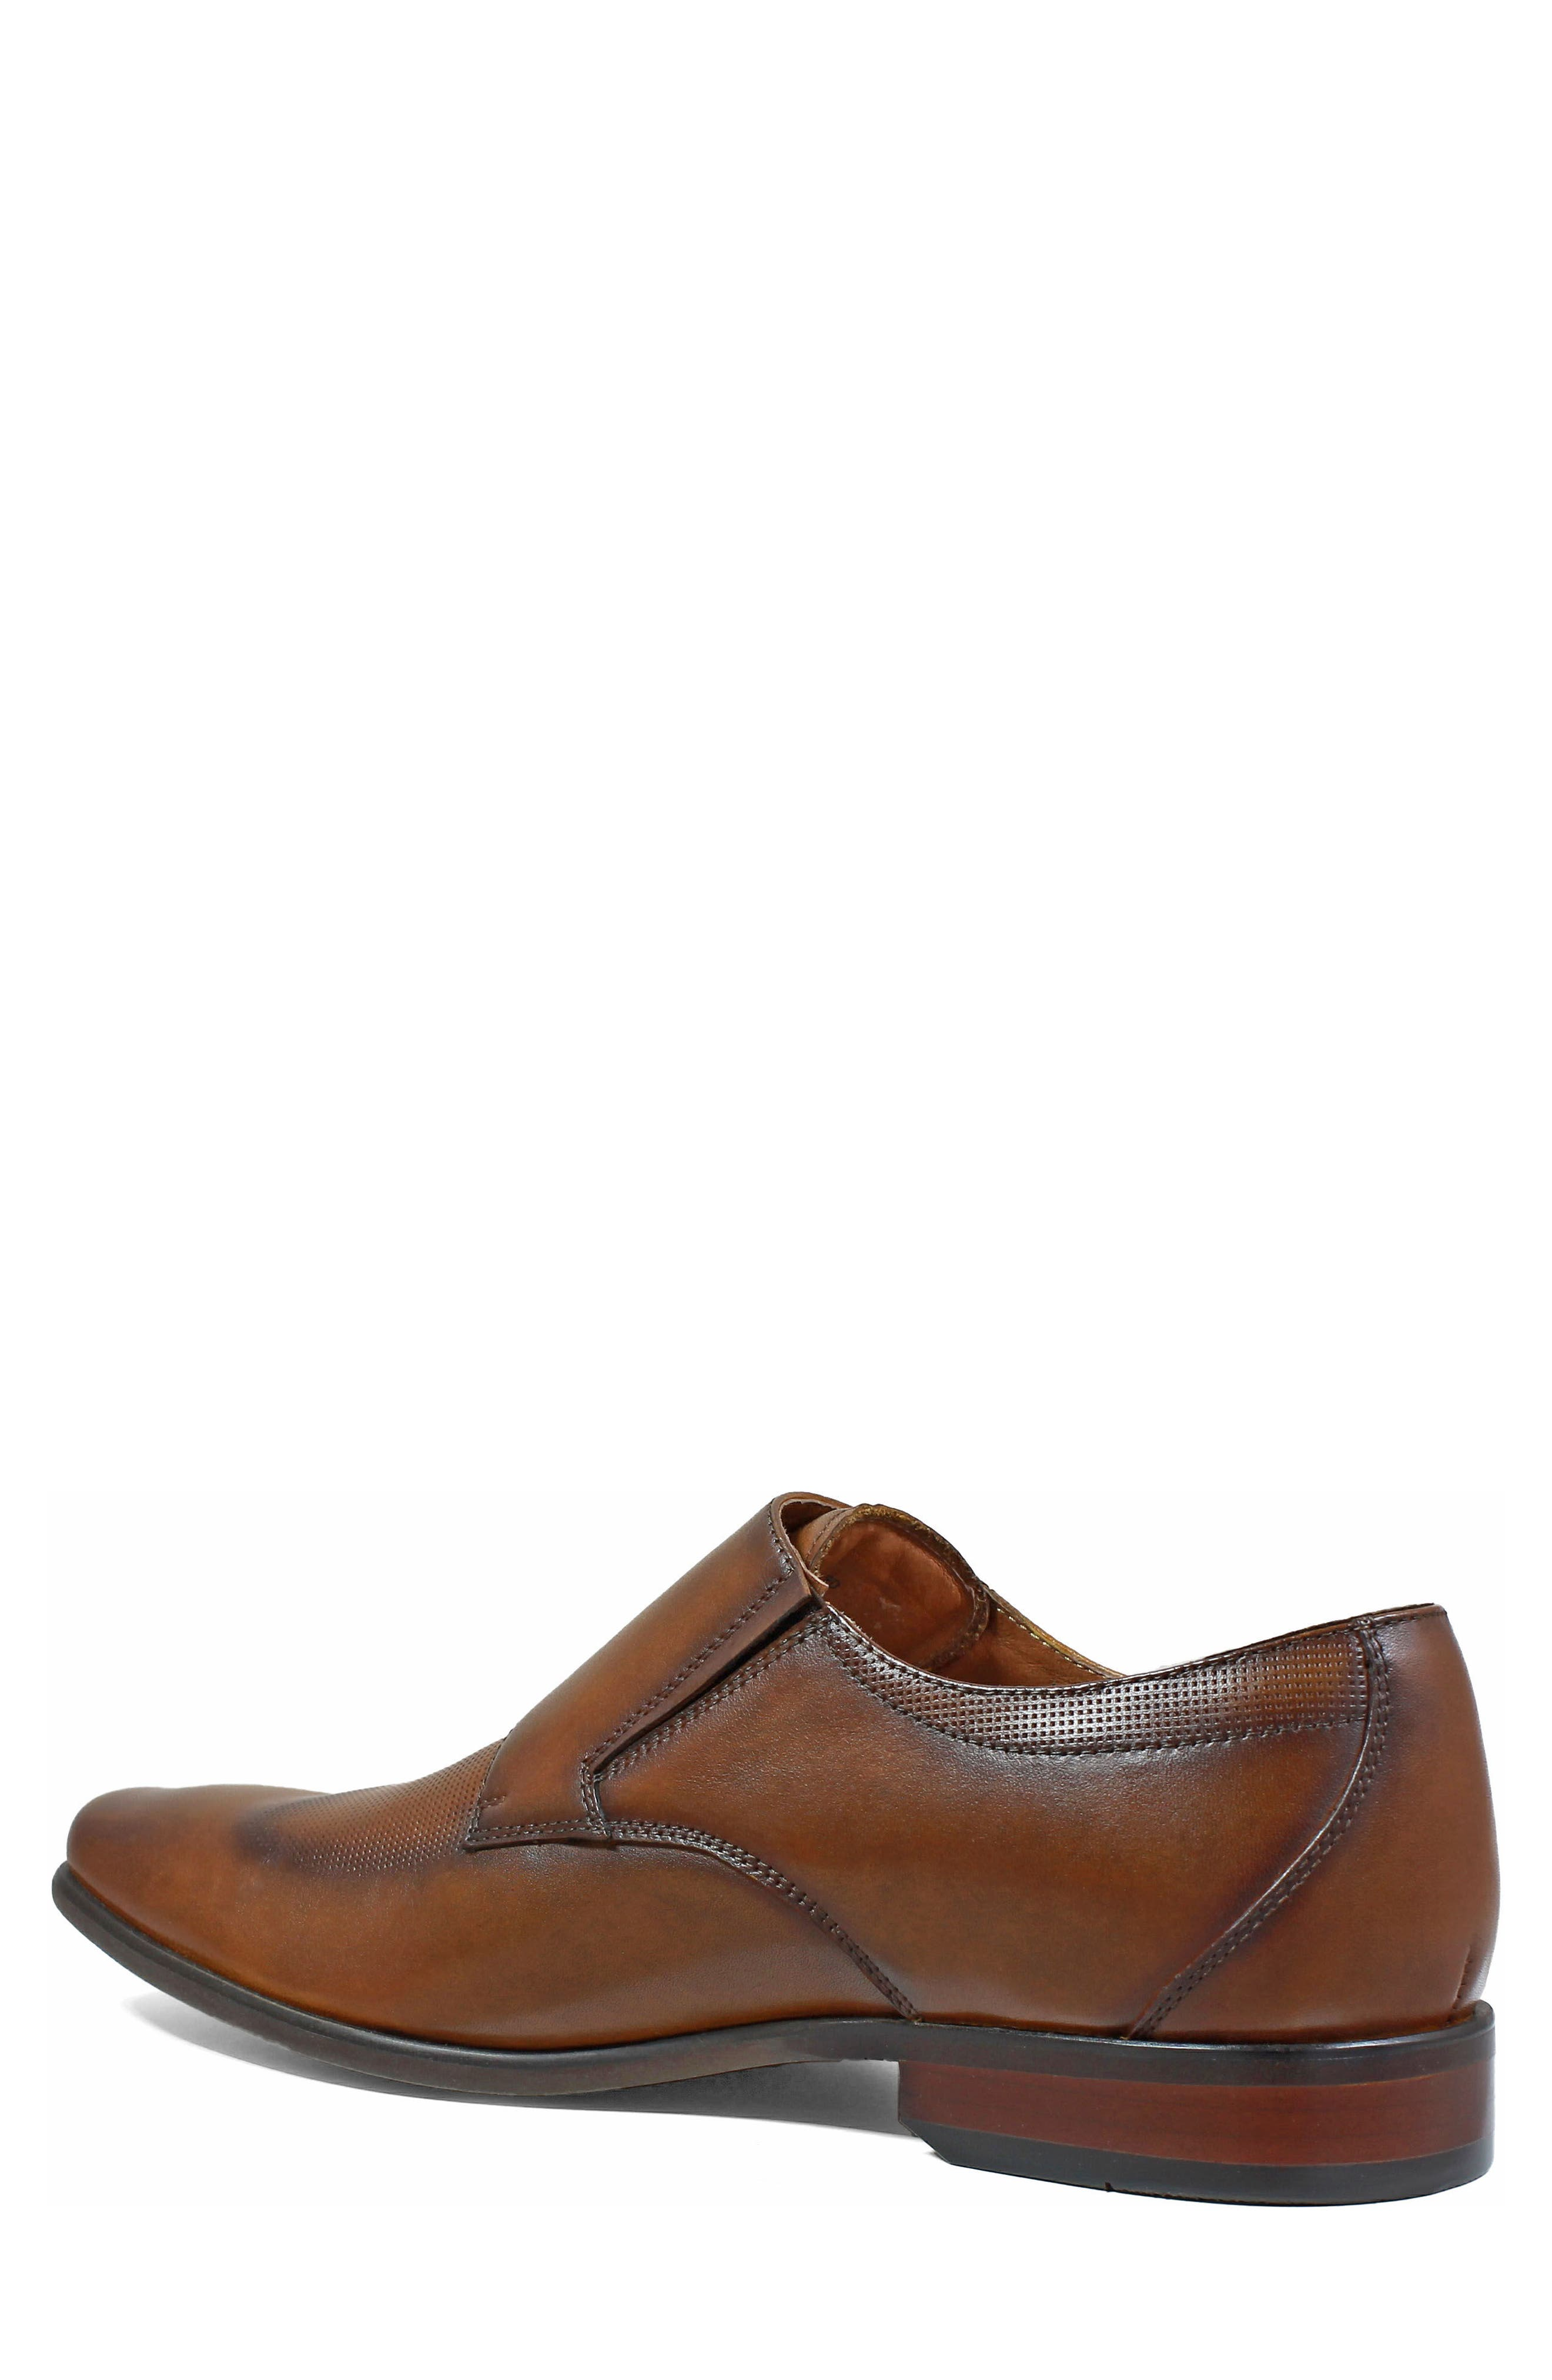 Postino Textured Double Strap Monk Shoe,                             Alternate thumbnail 2, color,                             Cognac Leather